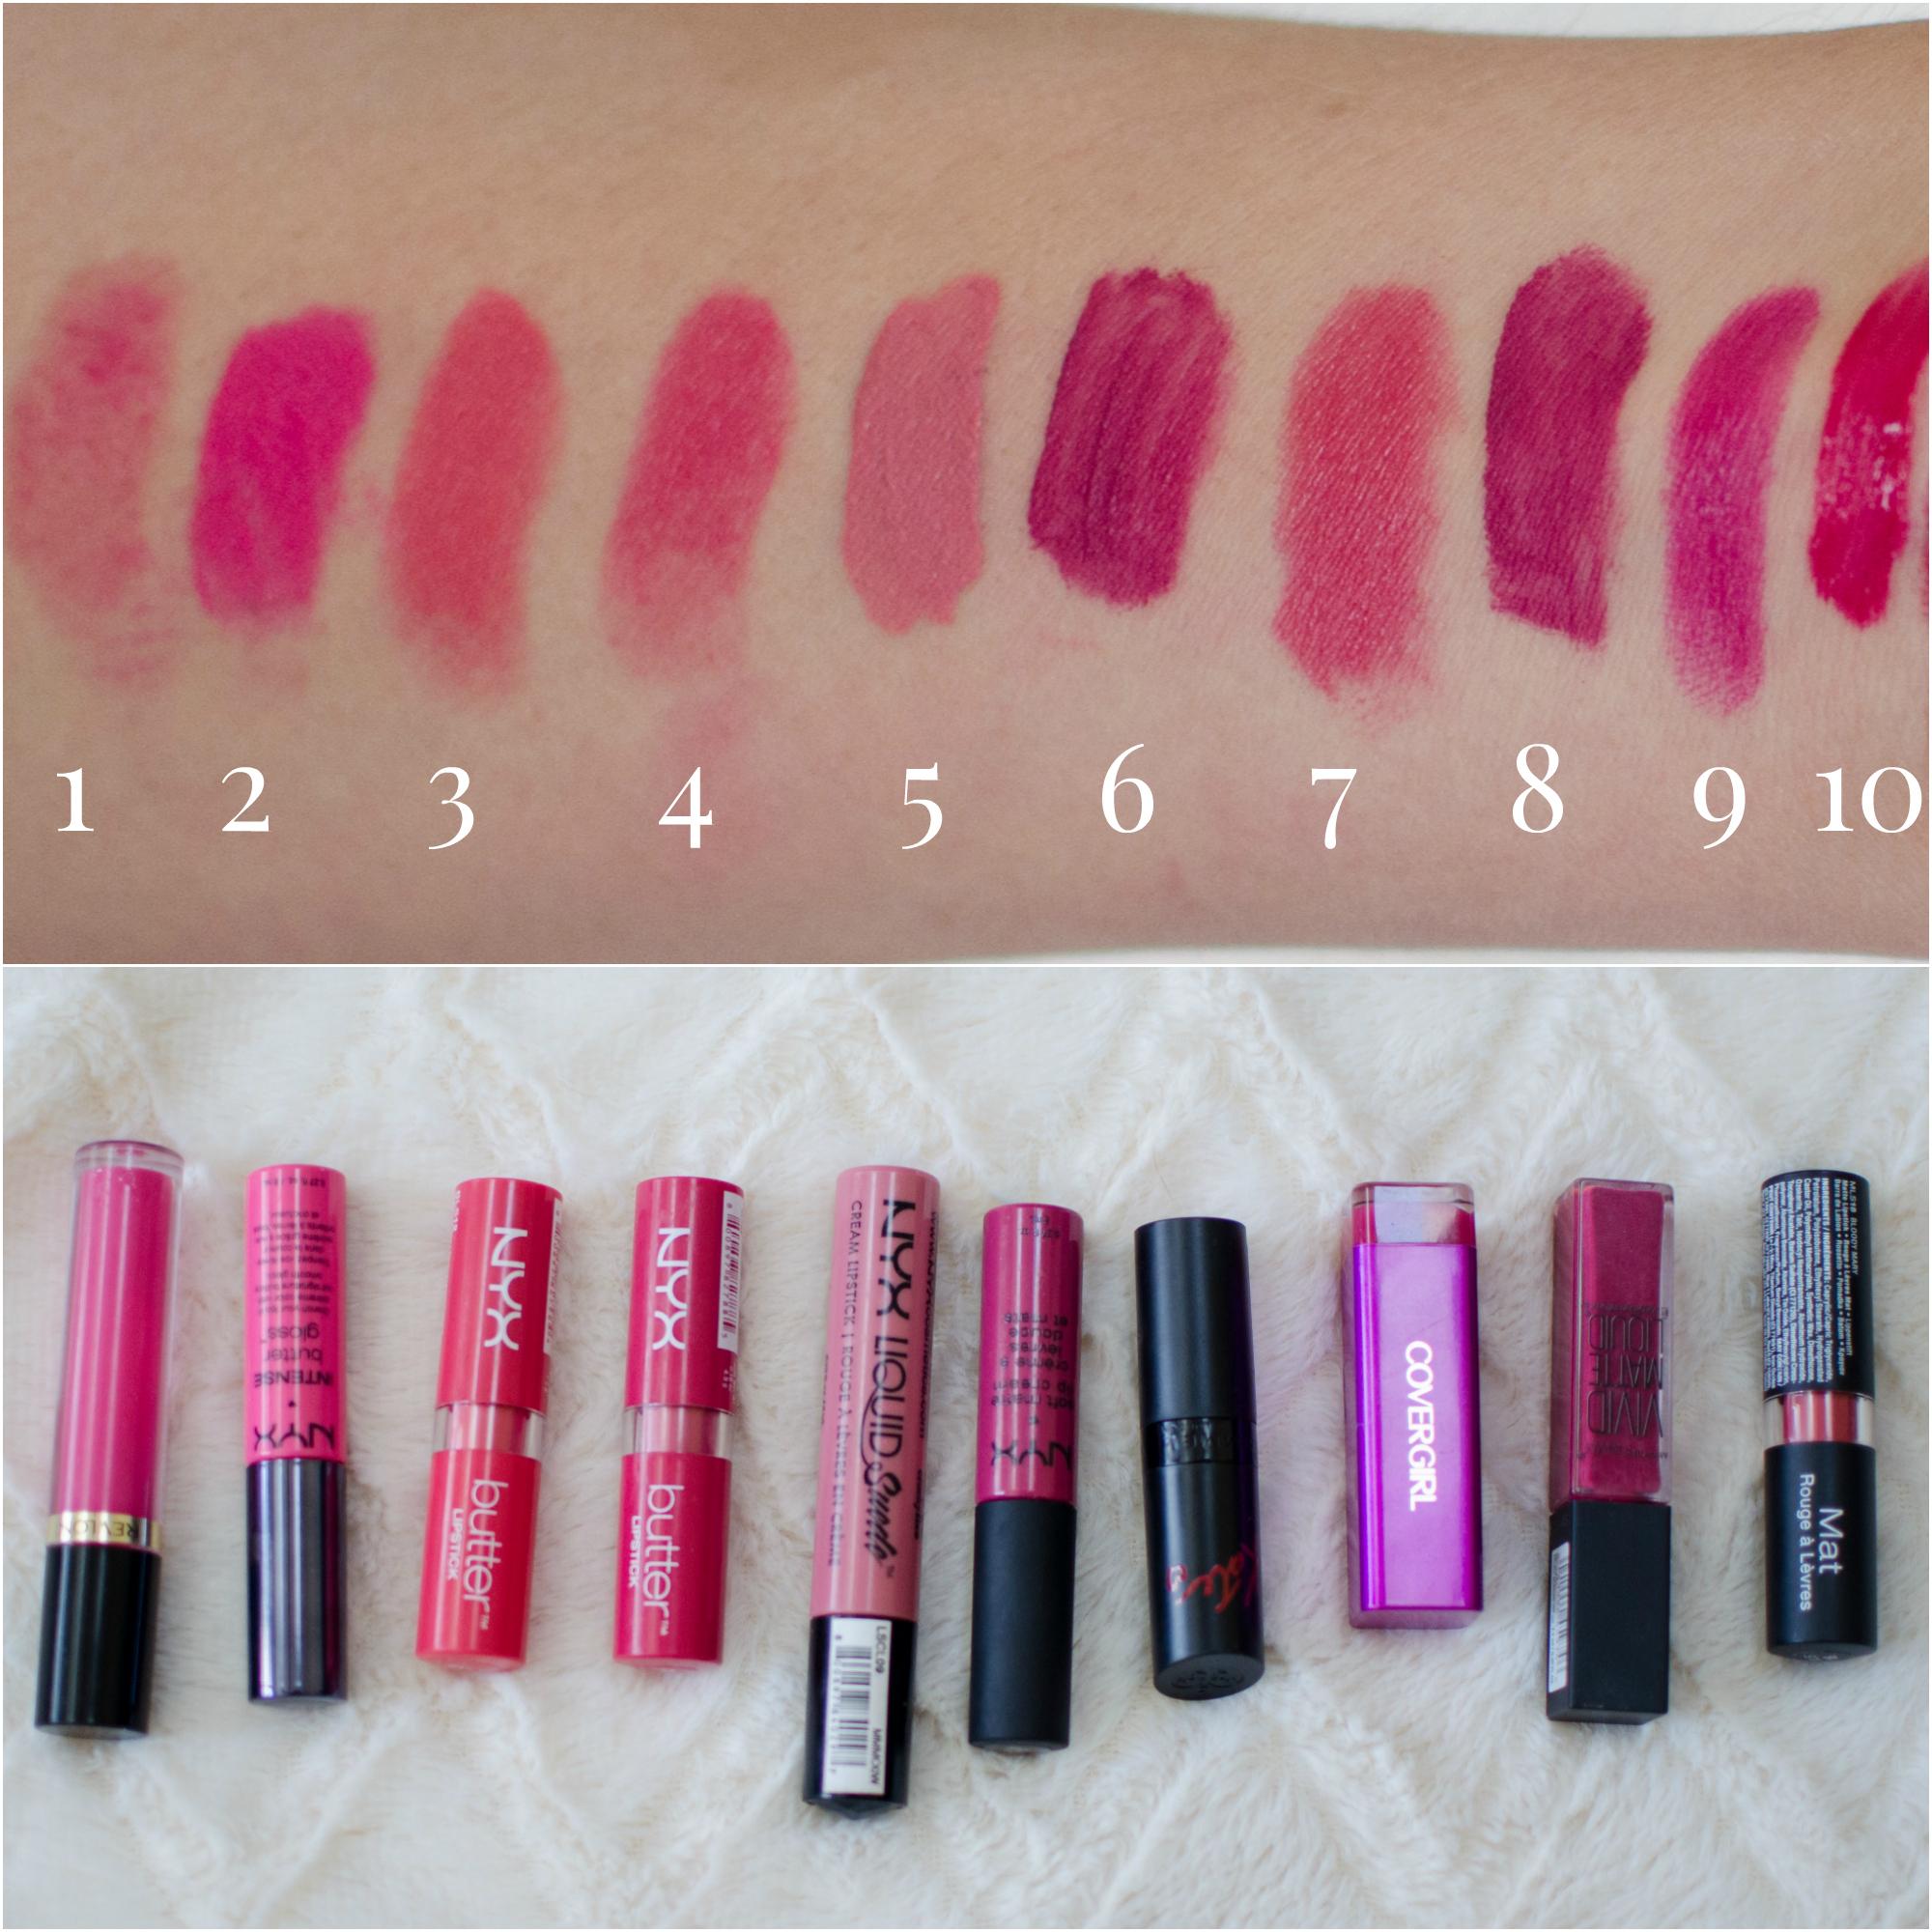 best pink lipstick shades | The Art Of Beauty